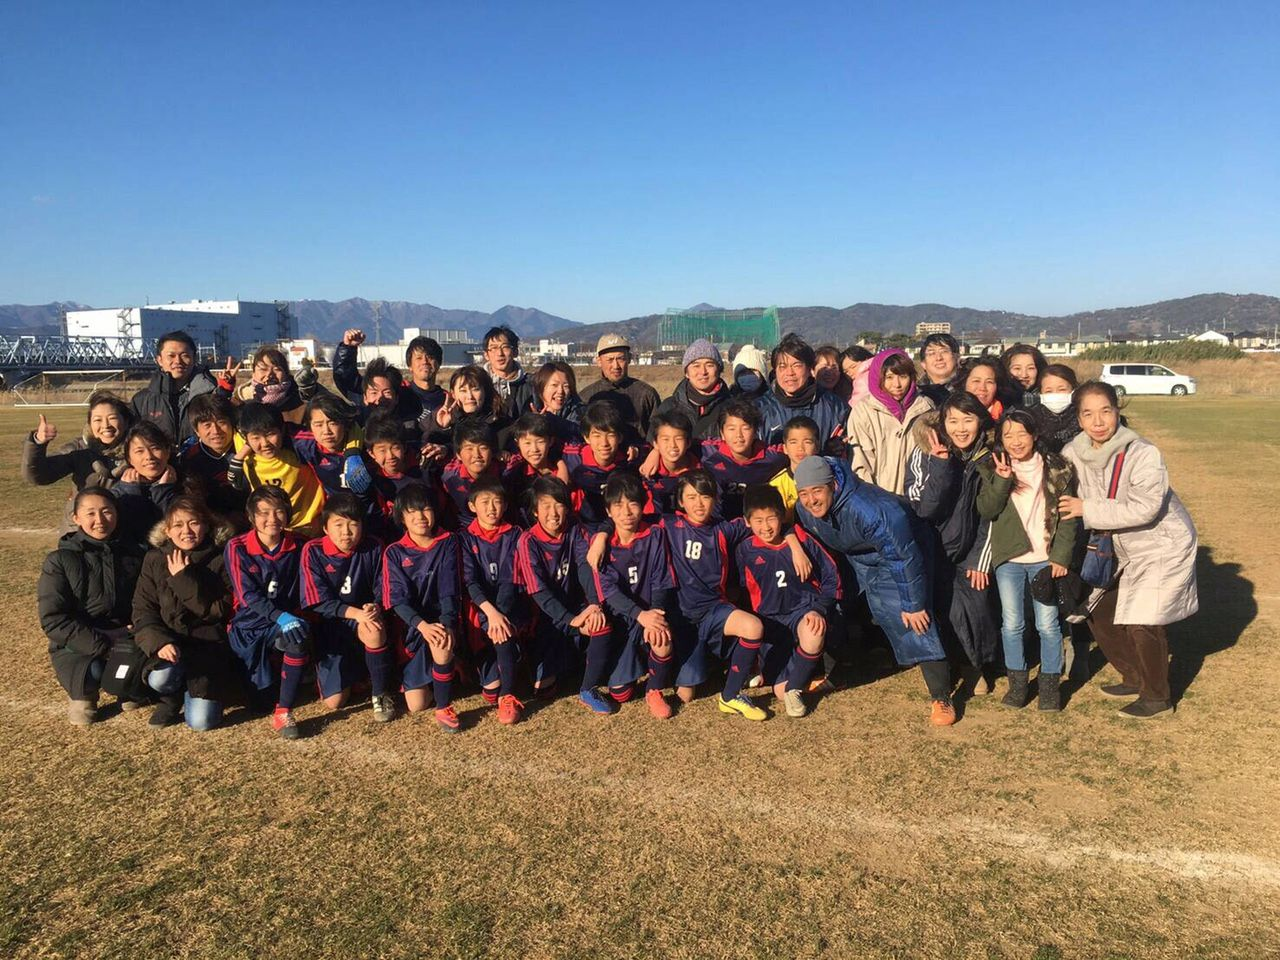 <br> 第43回 神奈川県少年サッカー選手権大会